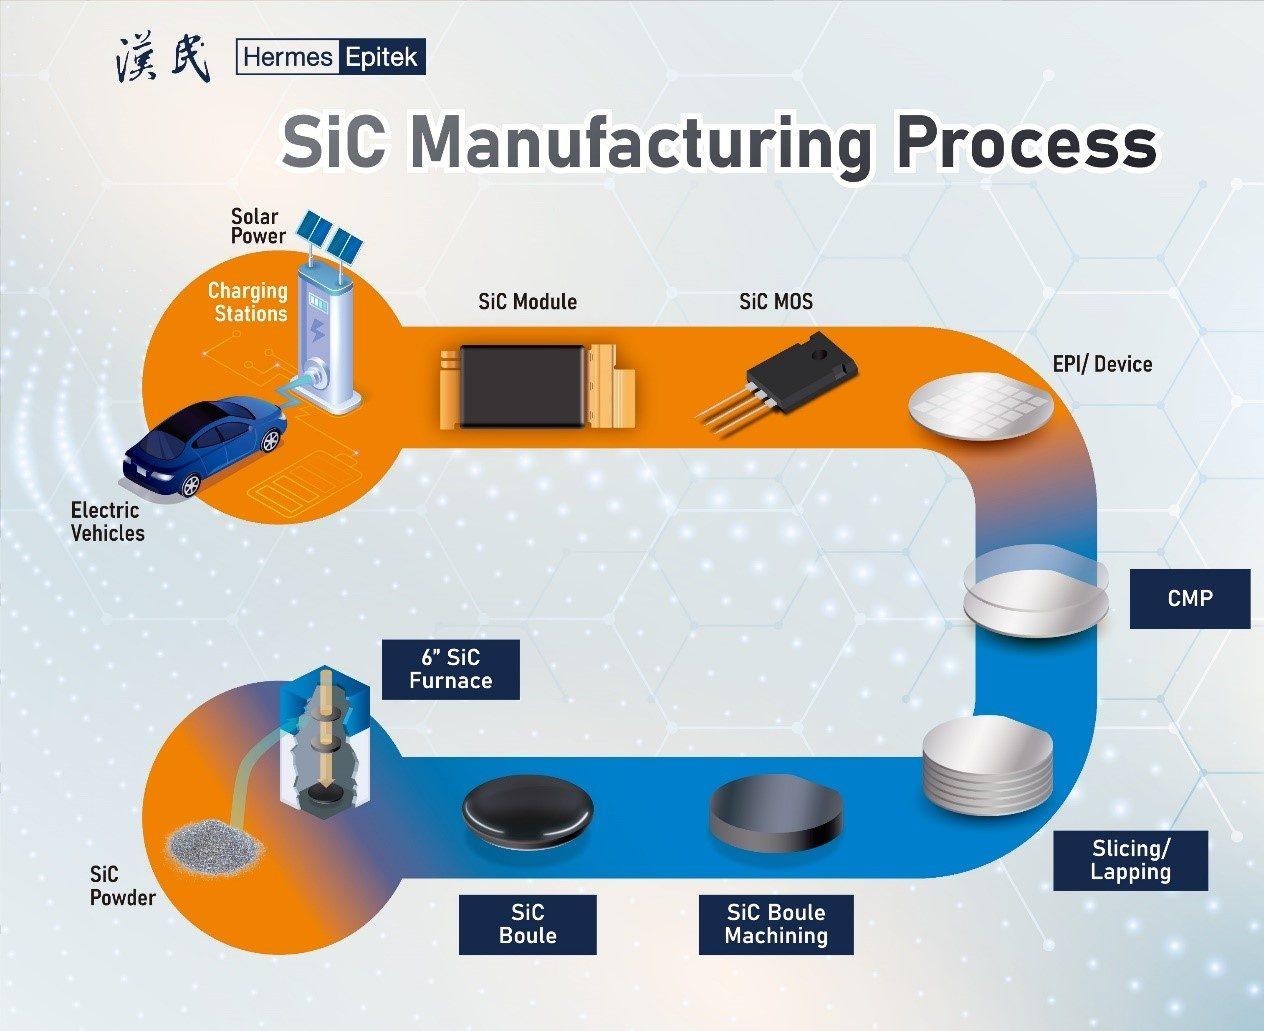 SiC Manufacturing Process